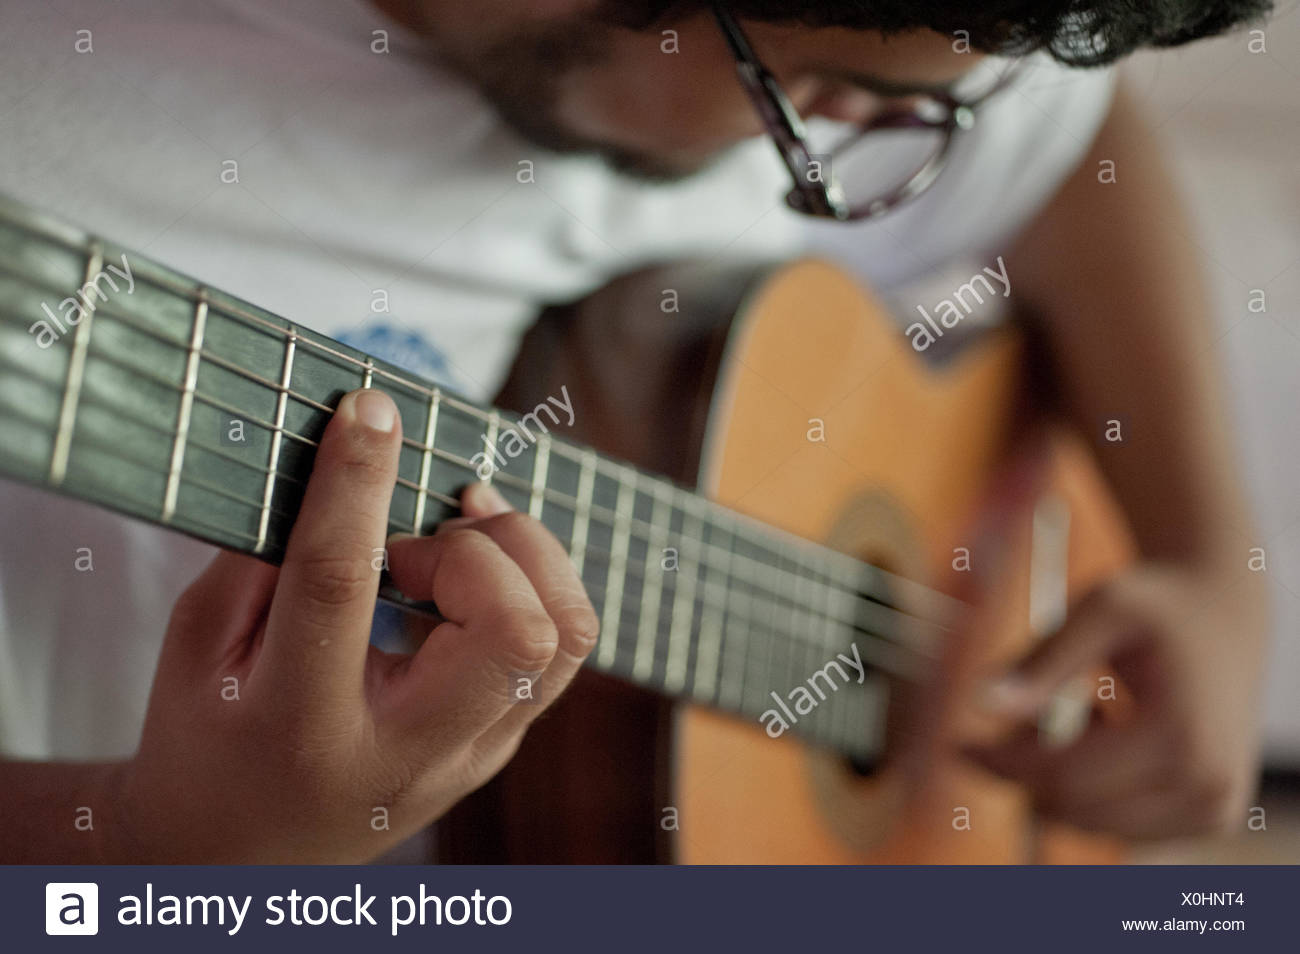 A man plays a flamenco guitar. - Stock Image